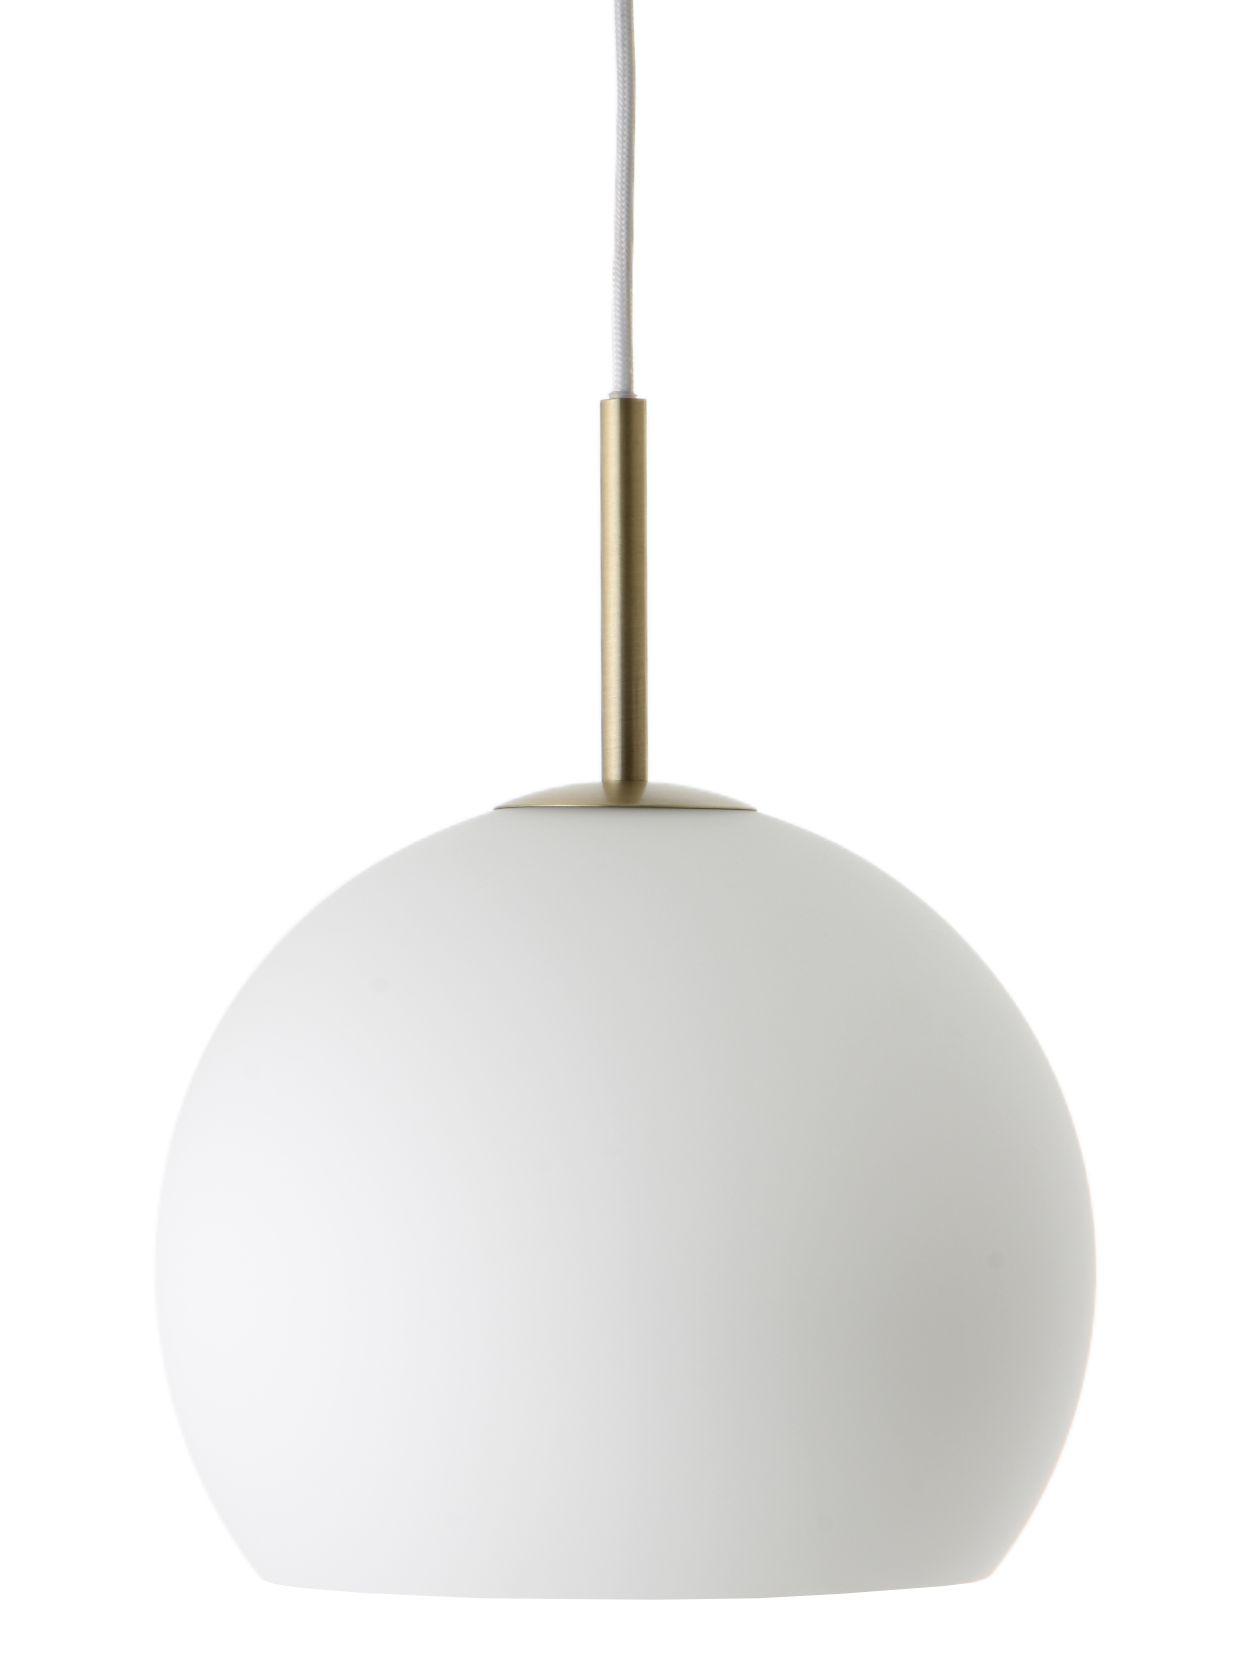 Frandsen Ball pendel, Ø25 cm, opal hvid